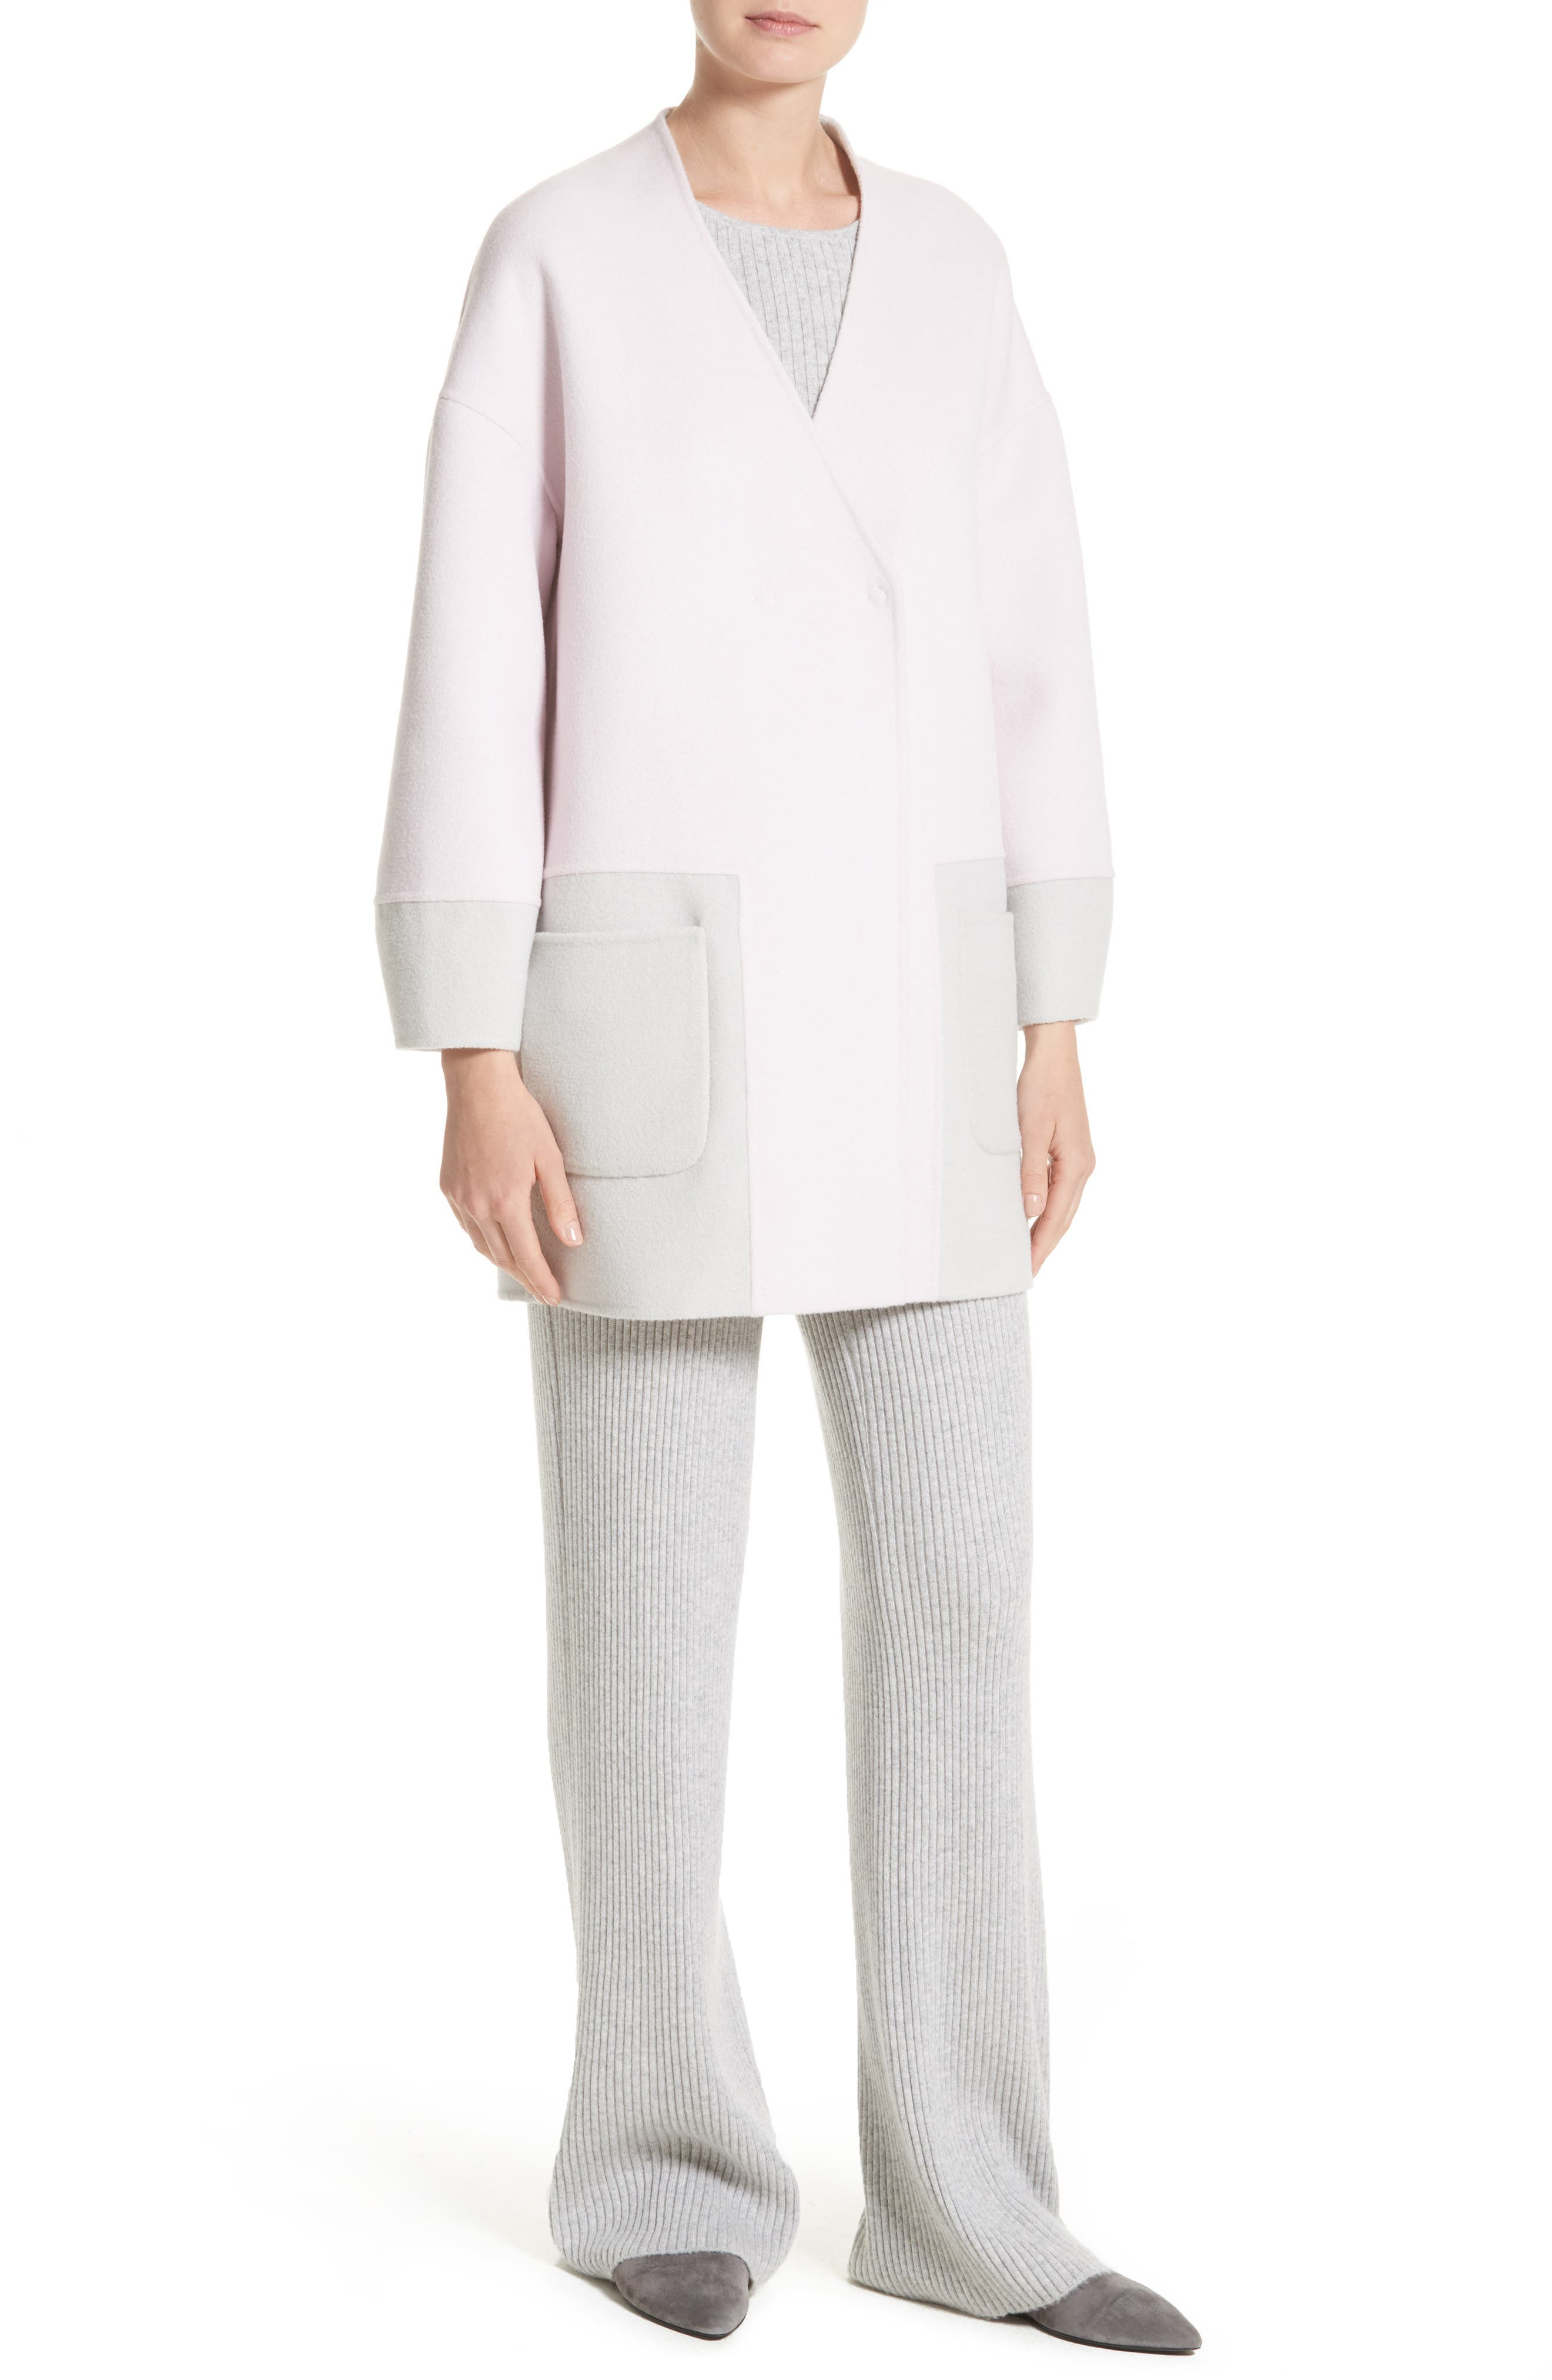 Reversible Wool Blend Cocoon Coat,                             Alternate thumbnail 8, color,                             Petal/ Light Grey Melange